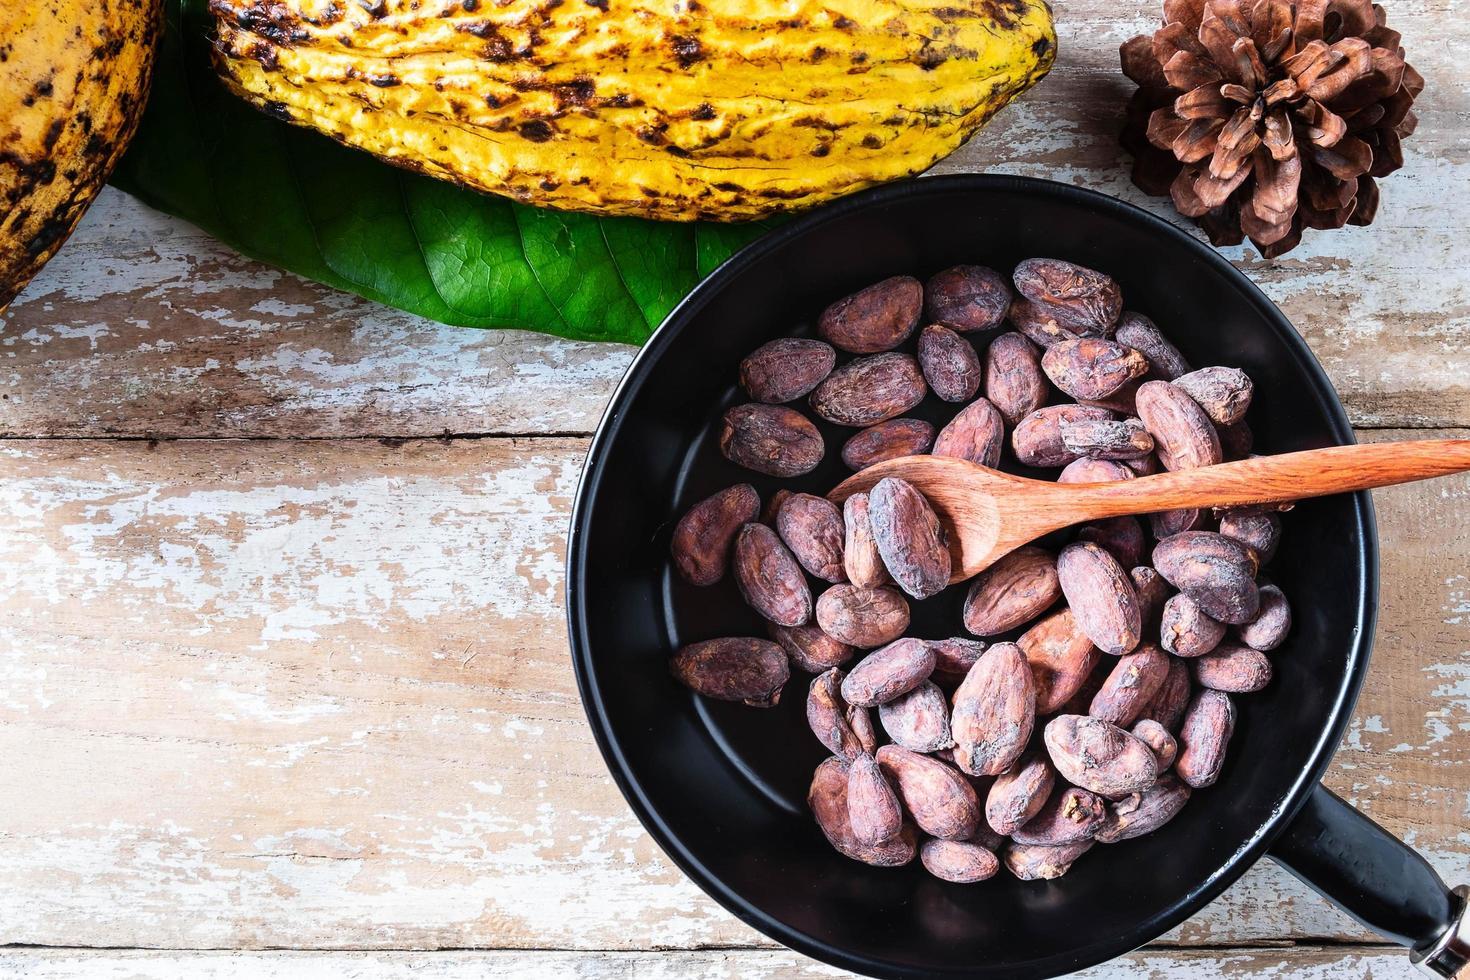 granos de cacao crudo y mazorcas de cacao foto